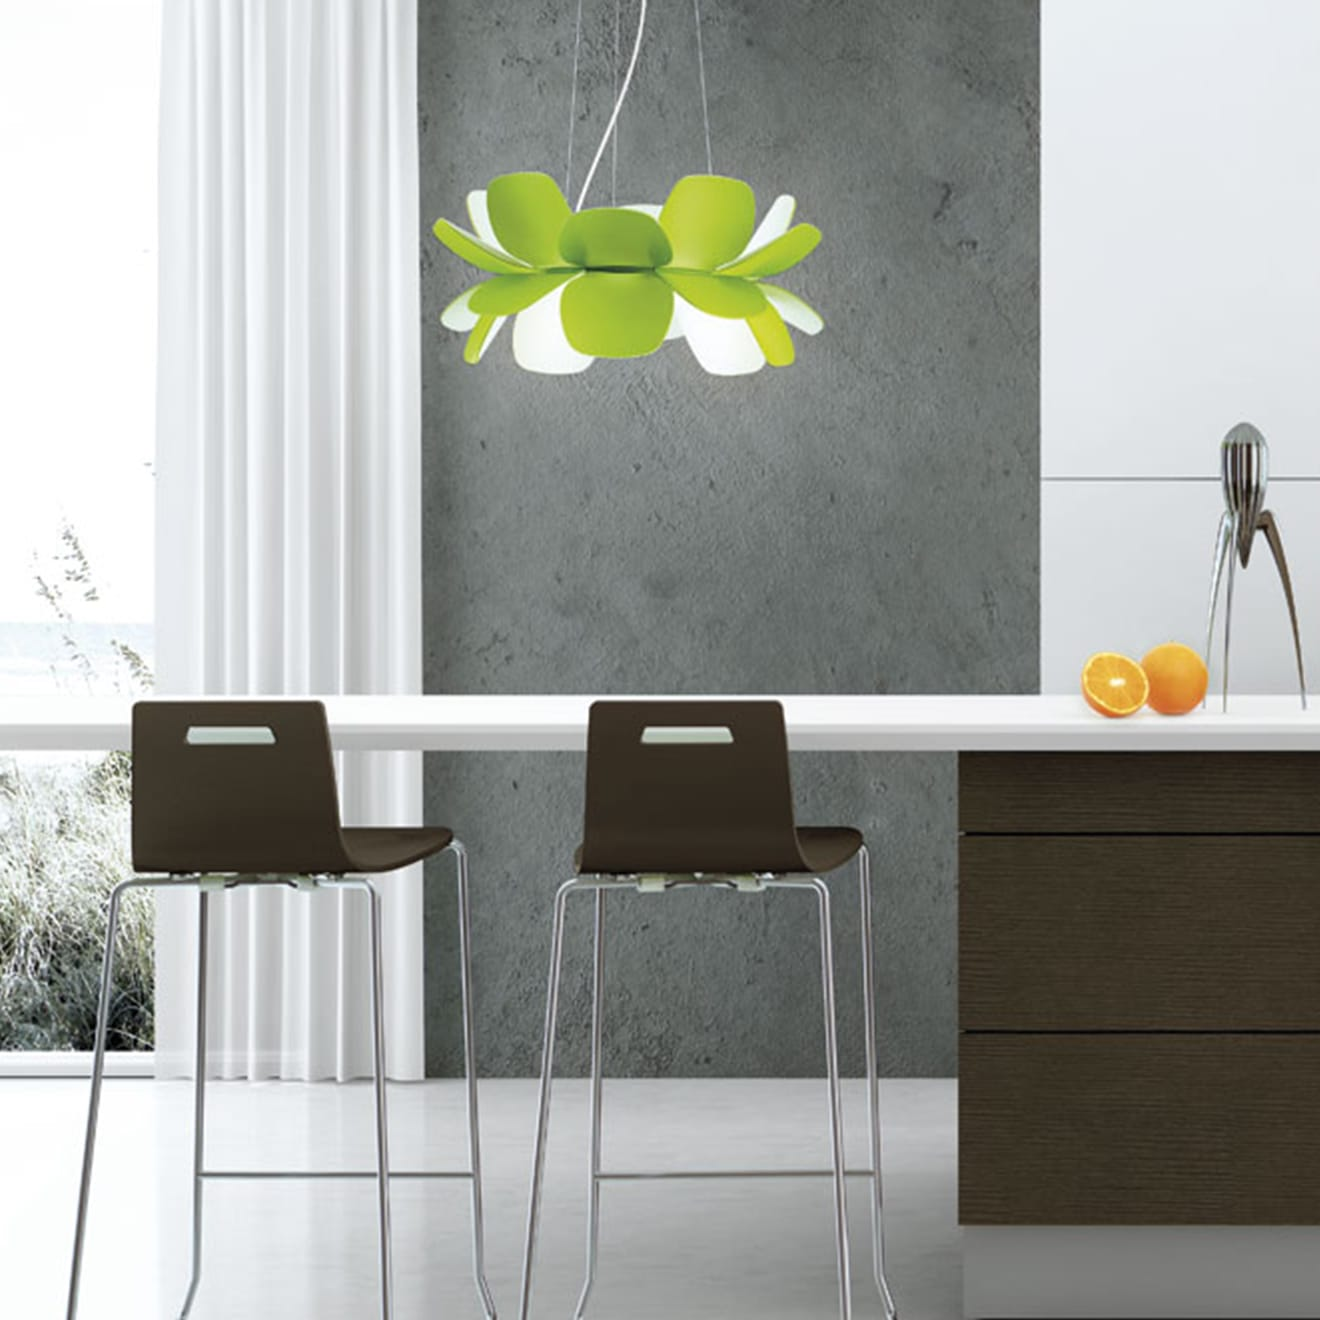 Infiore Pendant Lamp by Estiluz